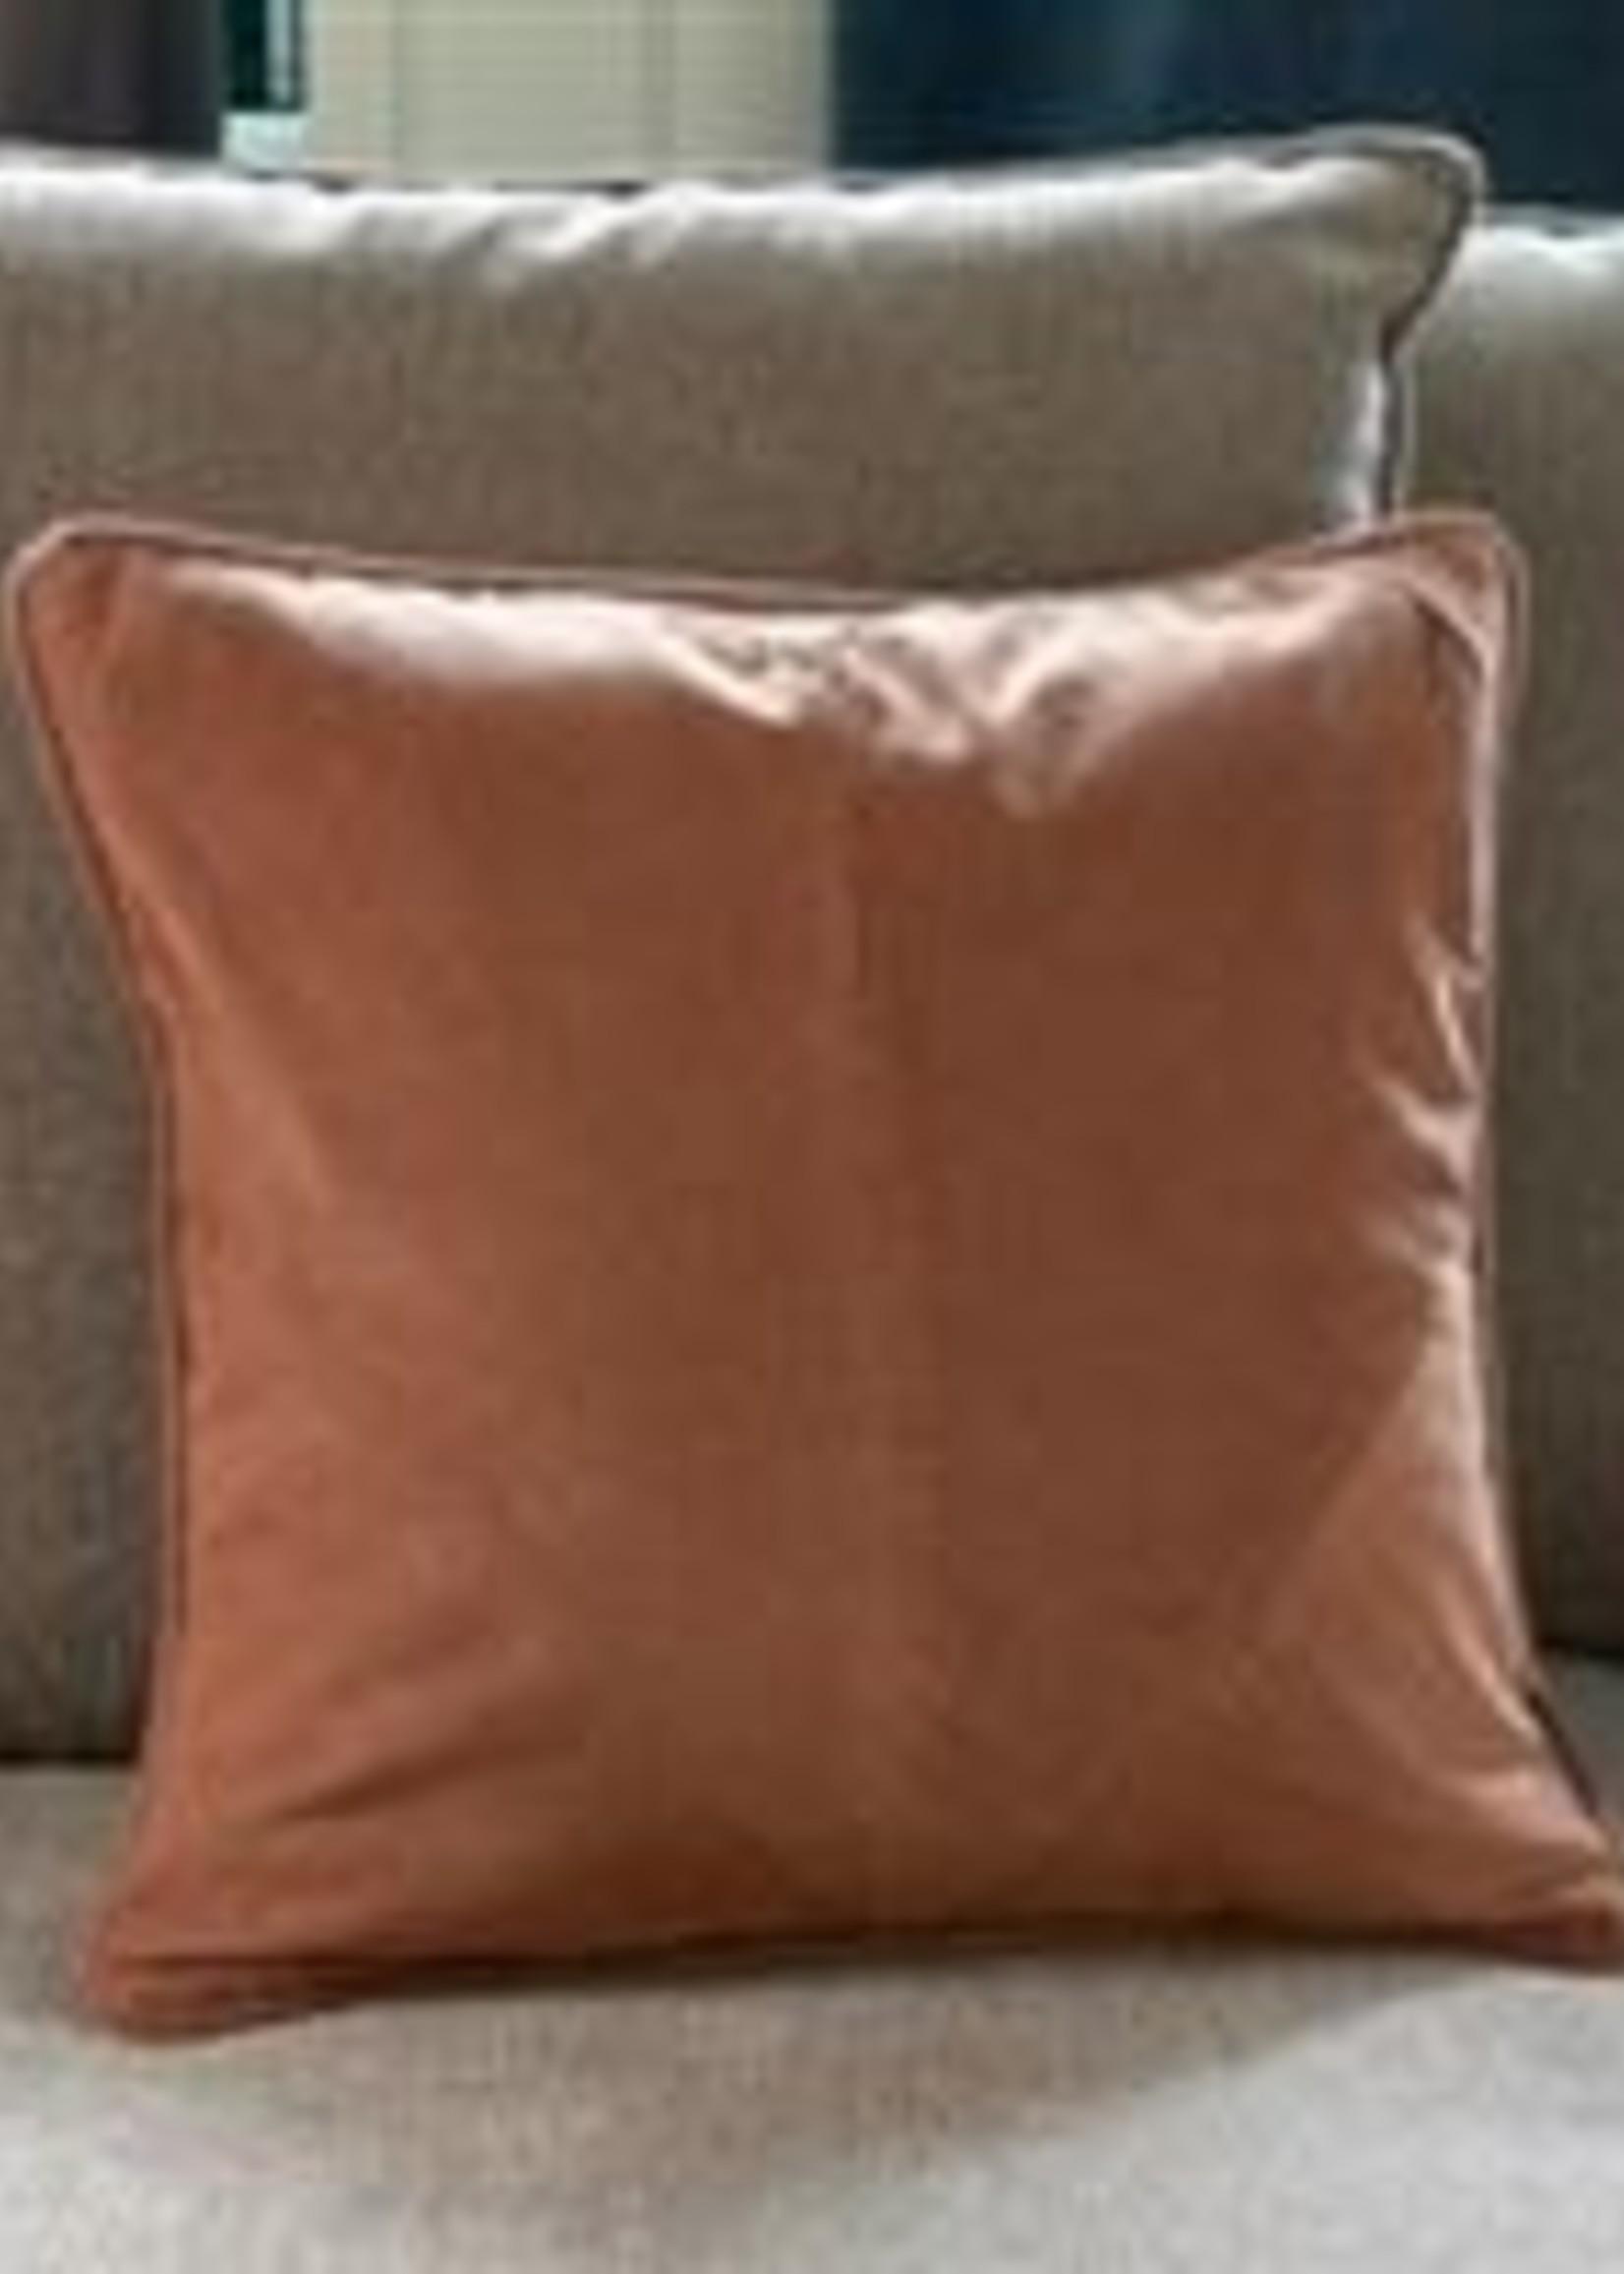 Riviera Maison Purity Rib Heart Pillow Cover 50x50